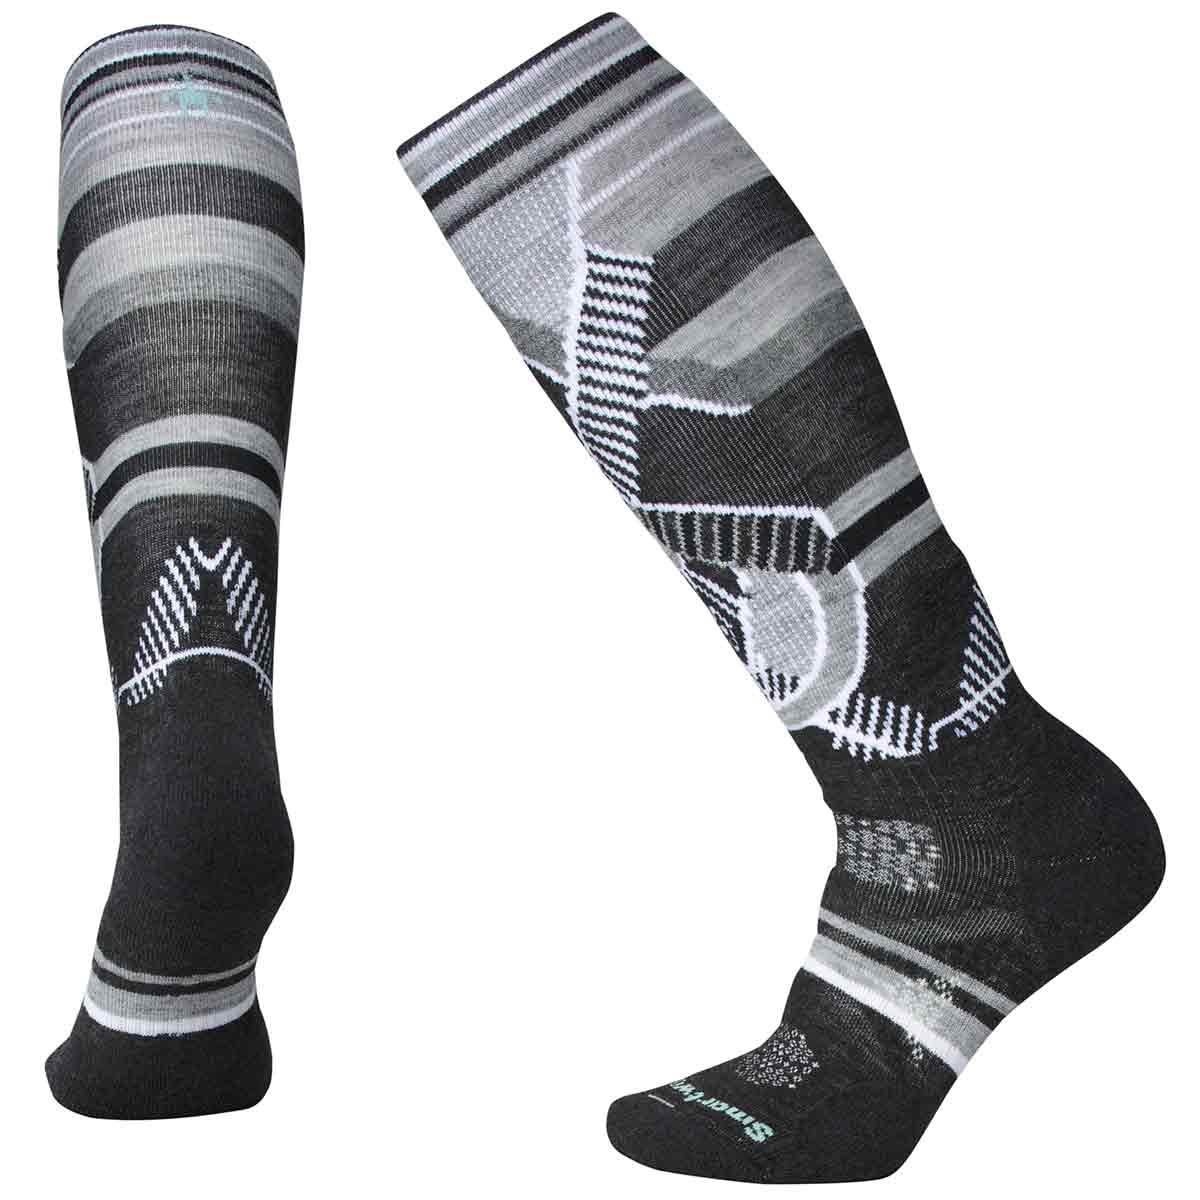 Smartwool Women's Phd Ski Medium Pattern Socks - Black, M